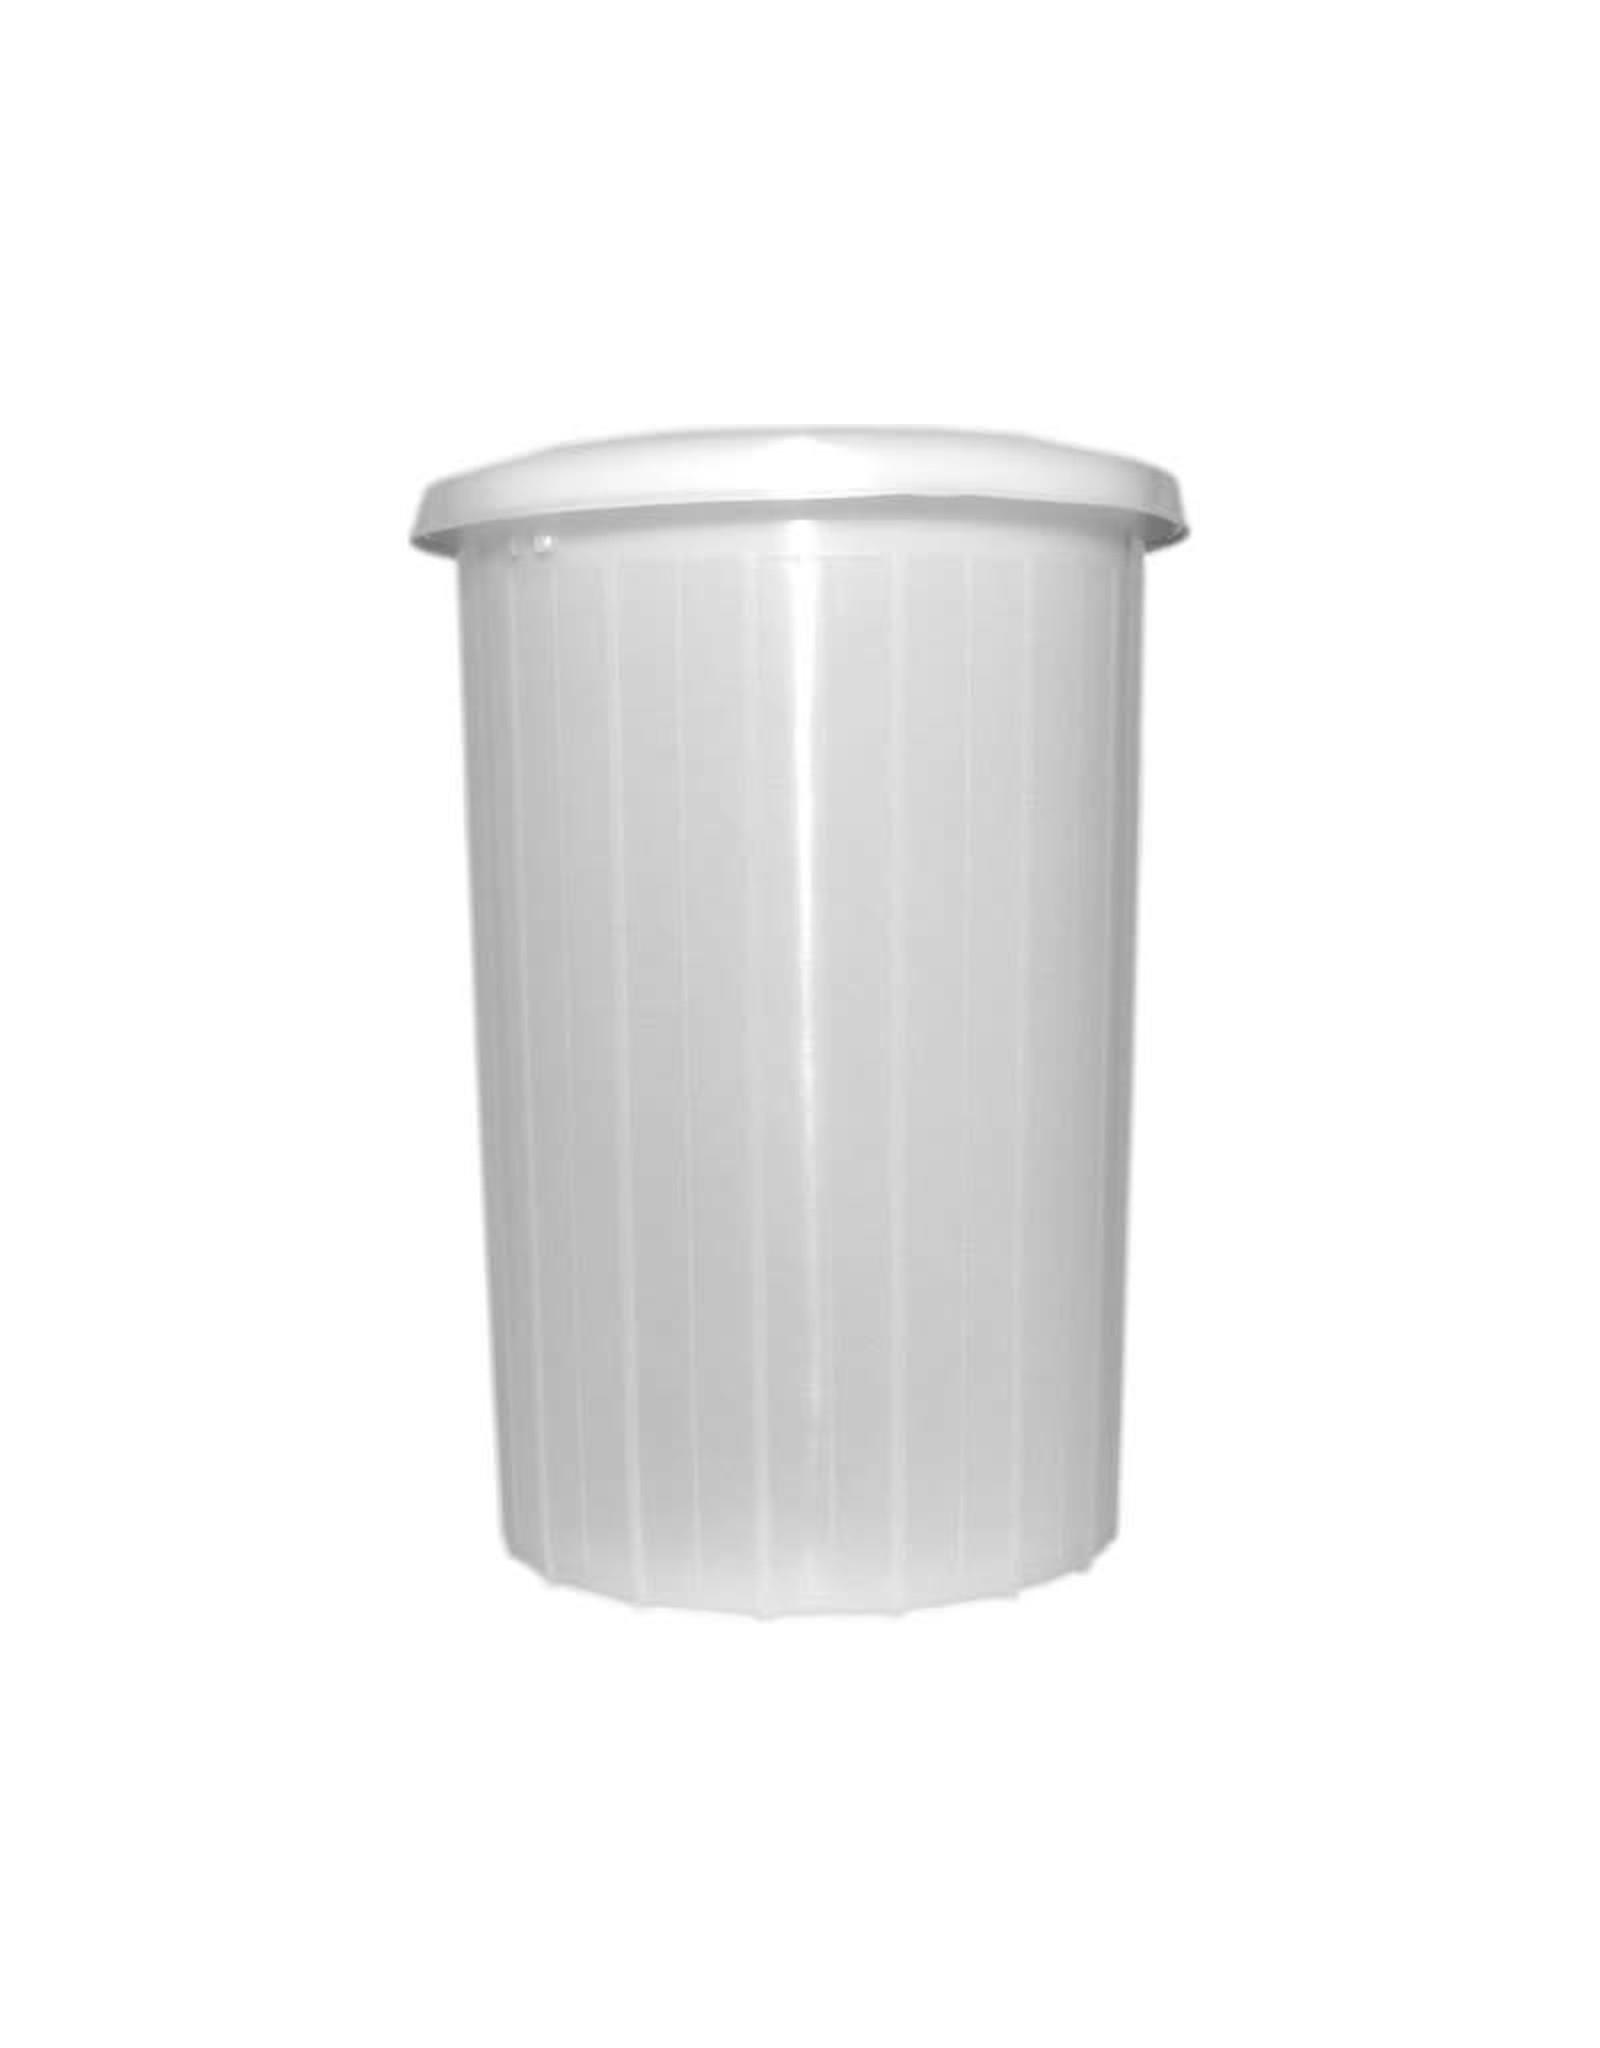 20 GALLON PLASTIC FERMENTR/LID